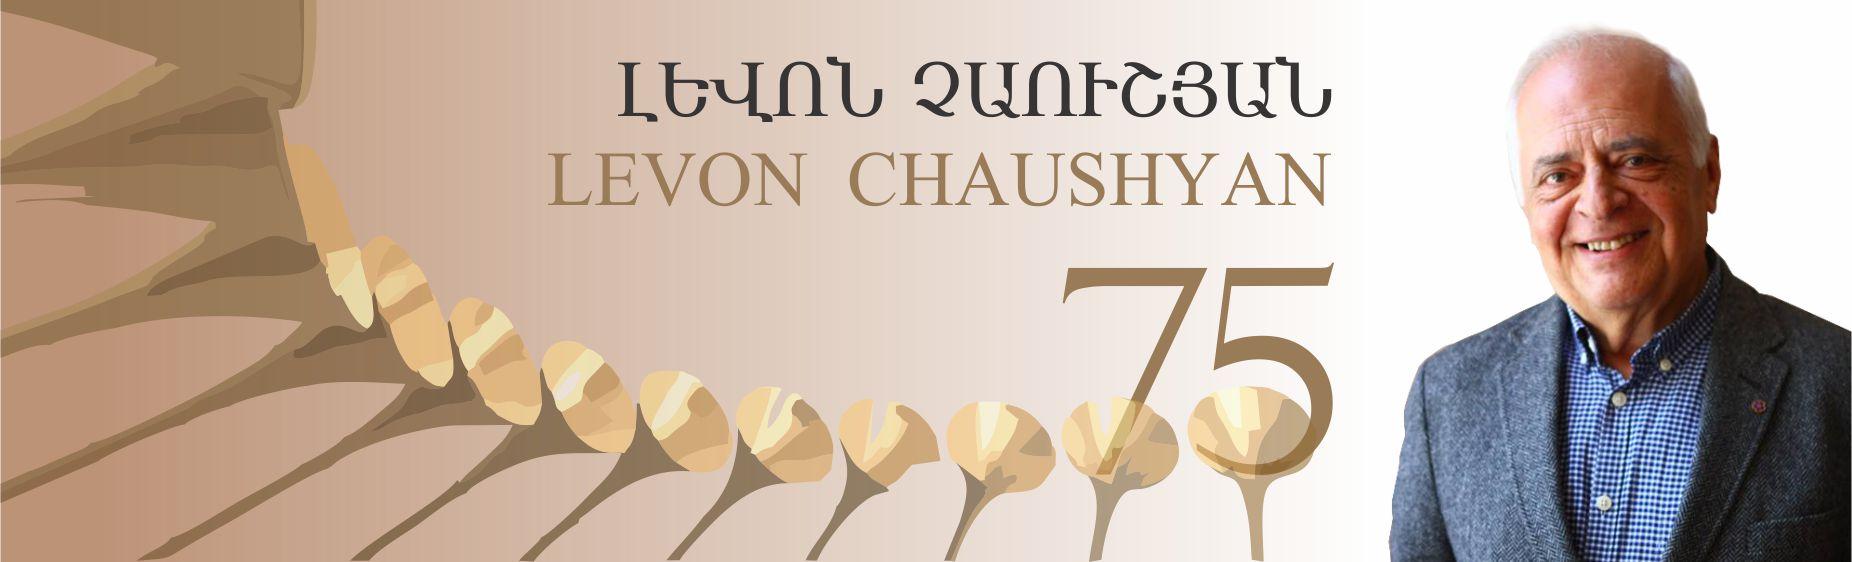 Chaushyan-75